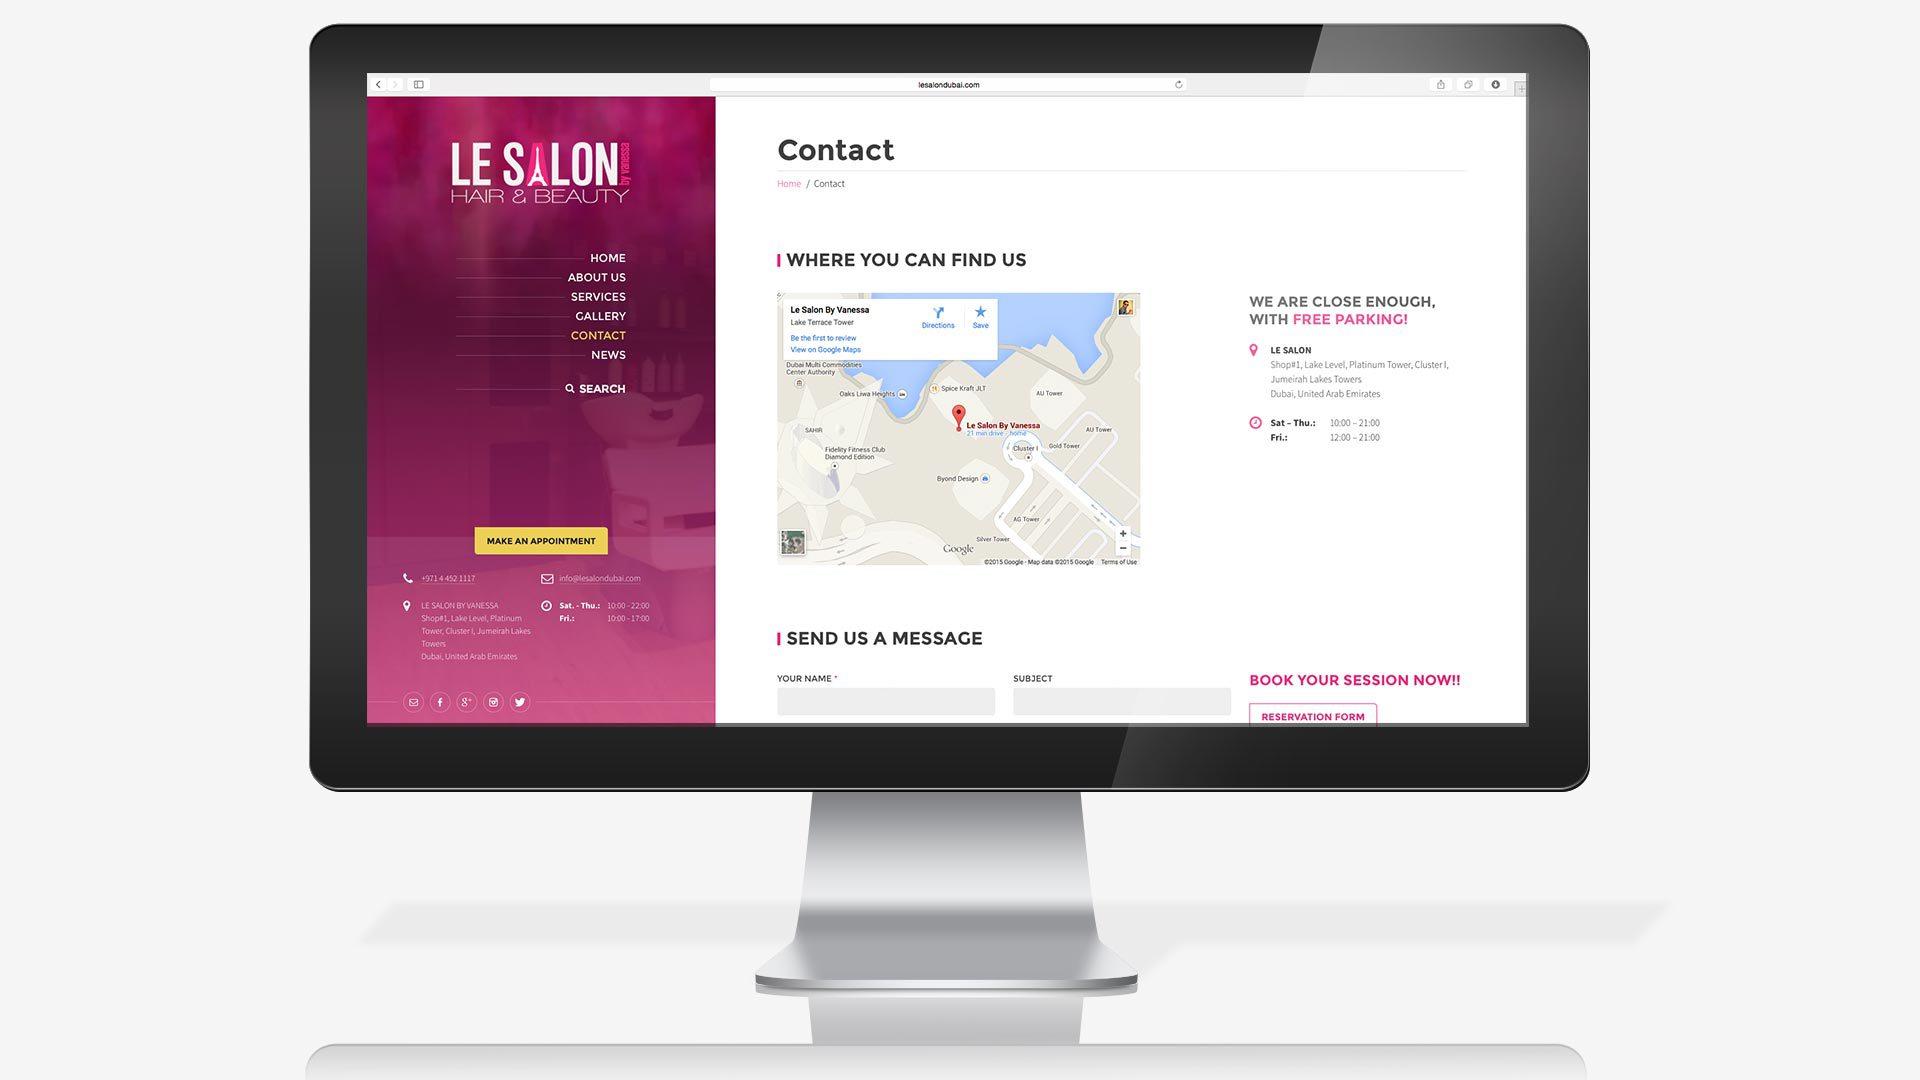 le-salon-website-contact